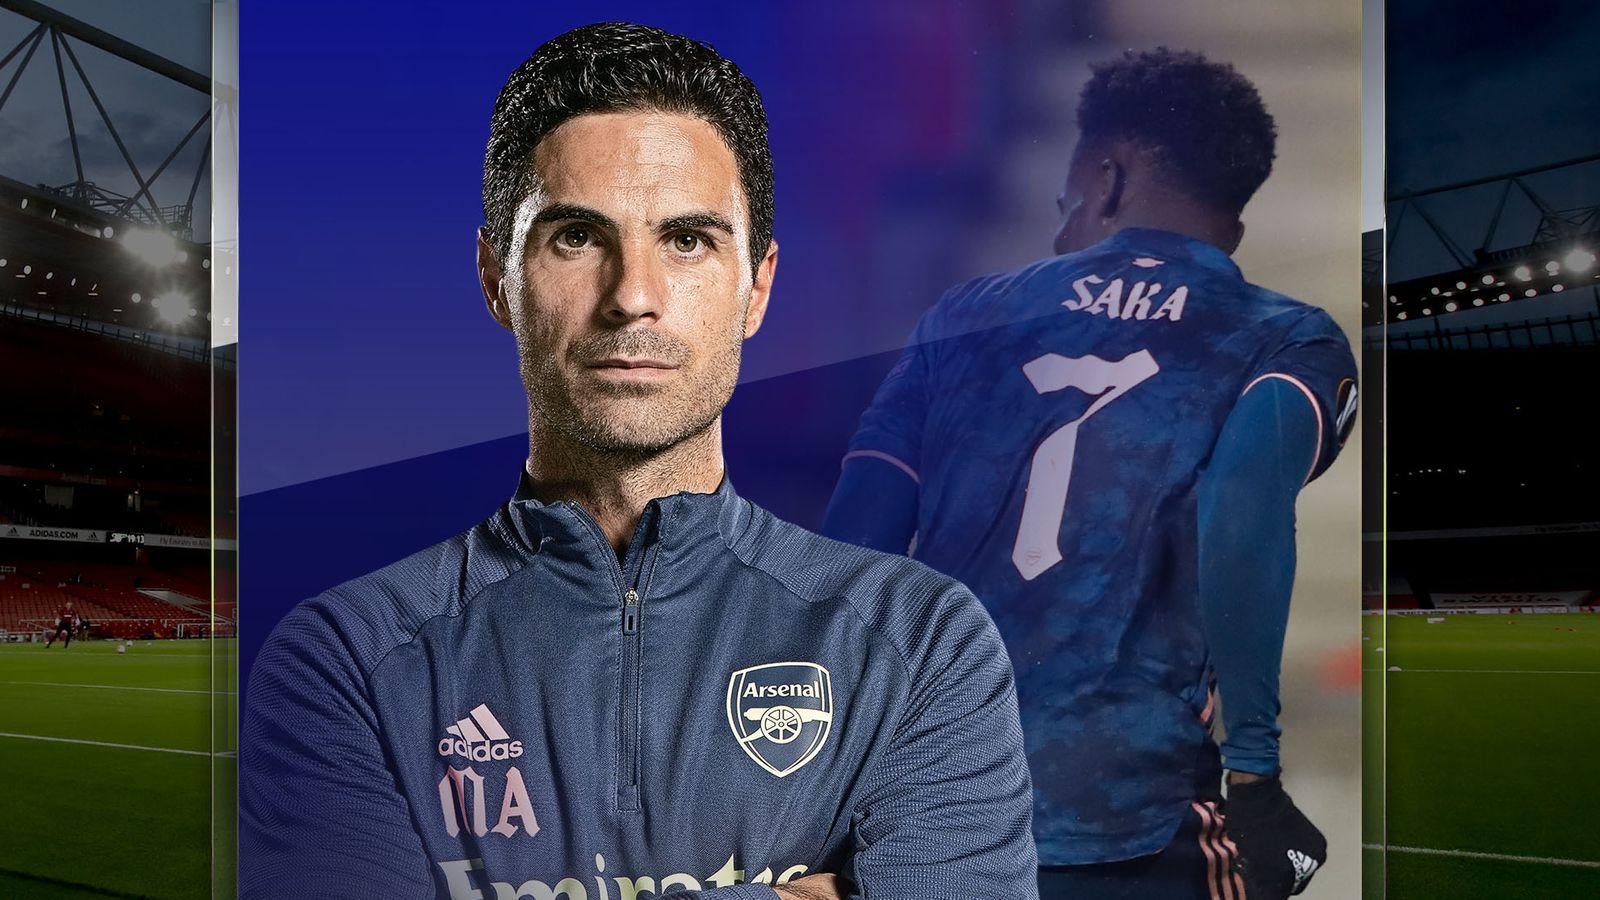 Arteta on Arsenal's youth revolution